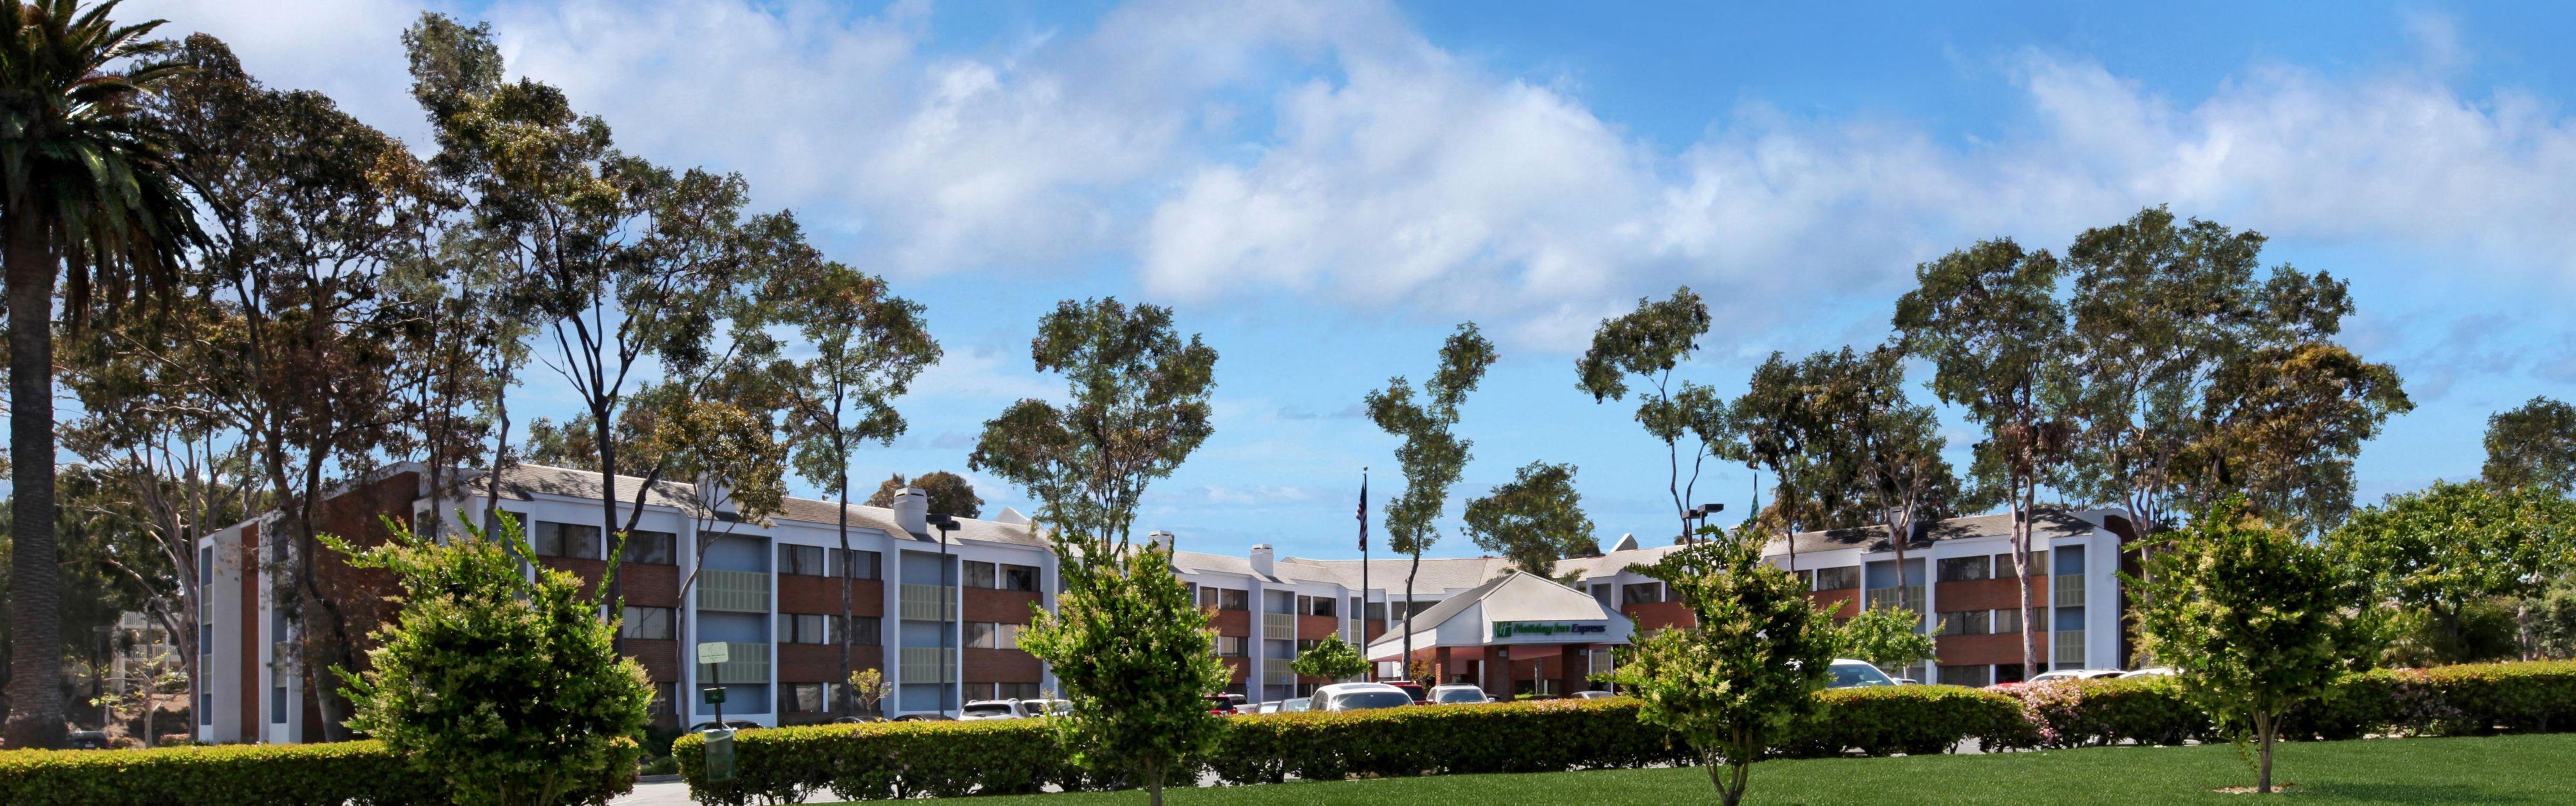 Holiday Inn Express Port Hueneme image 0